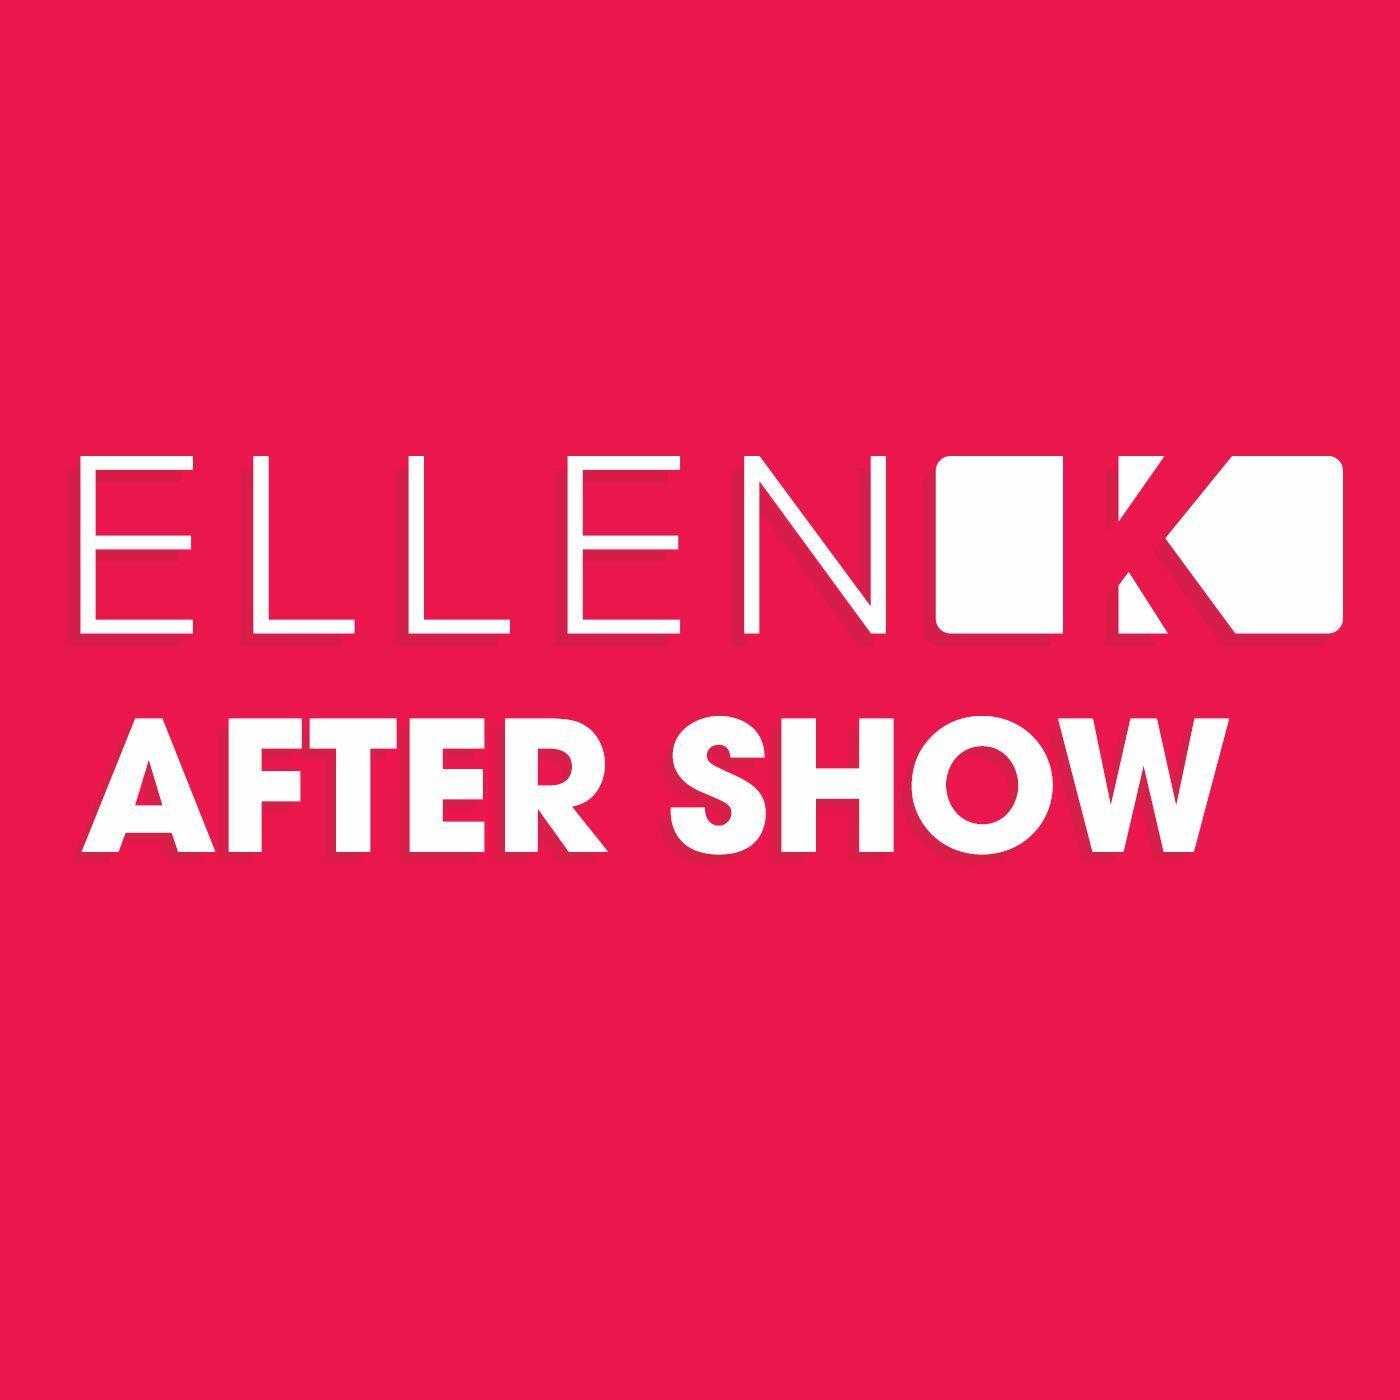 Ellen K After Show